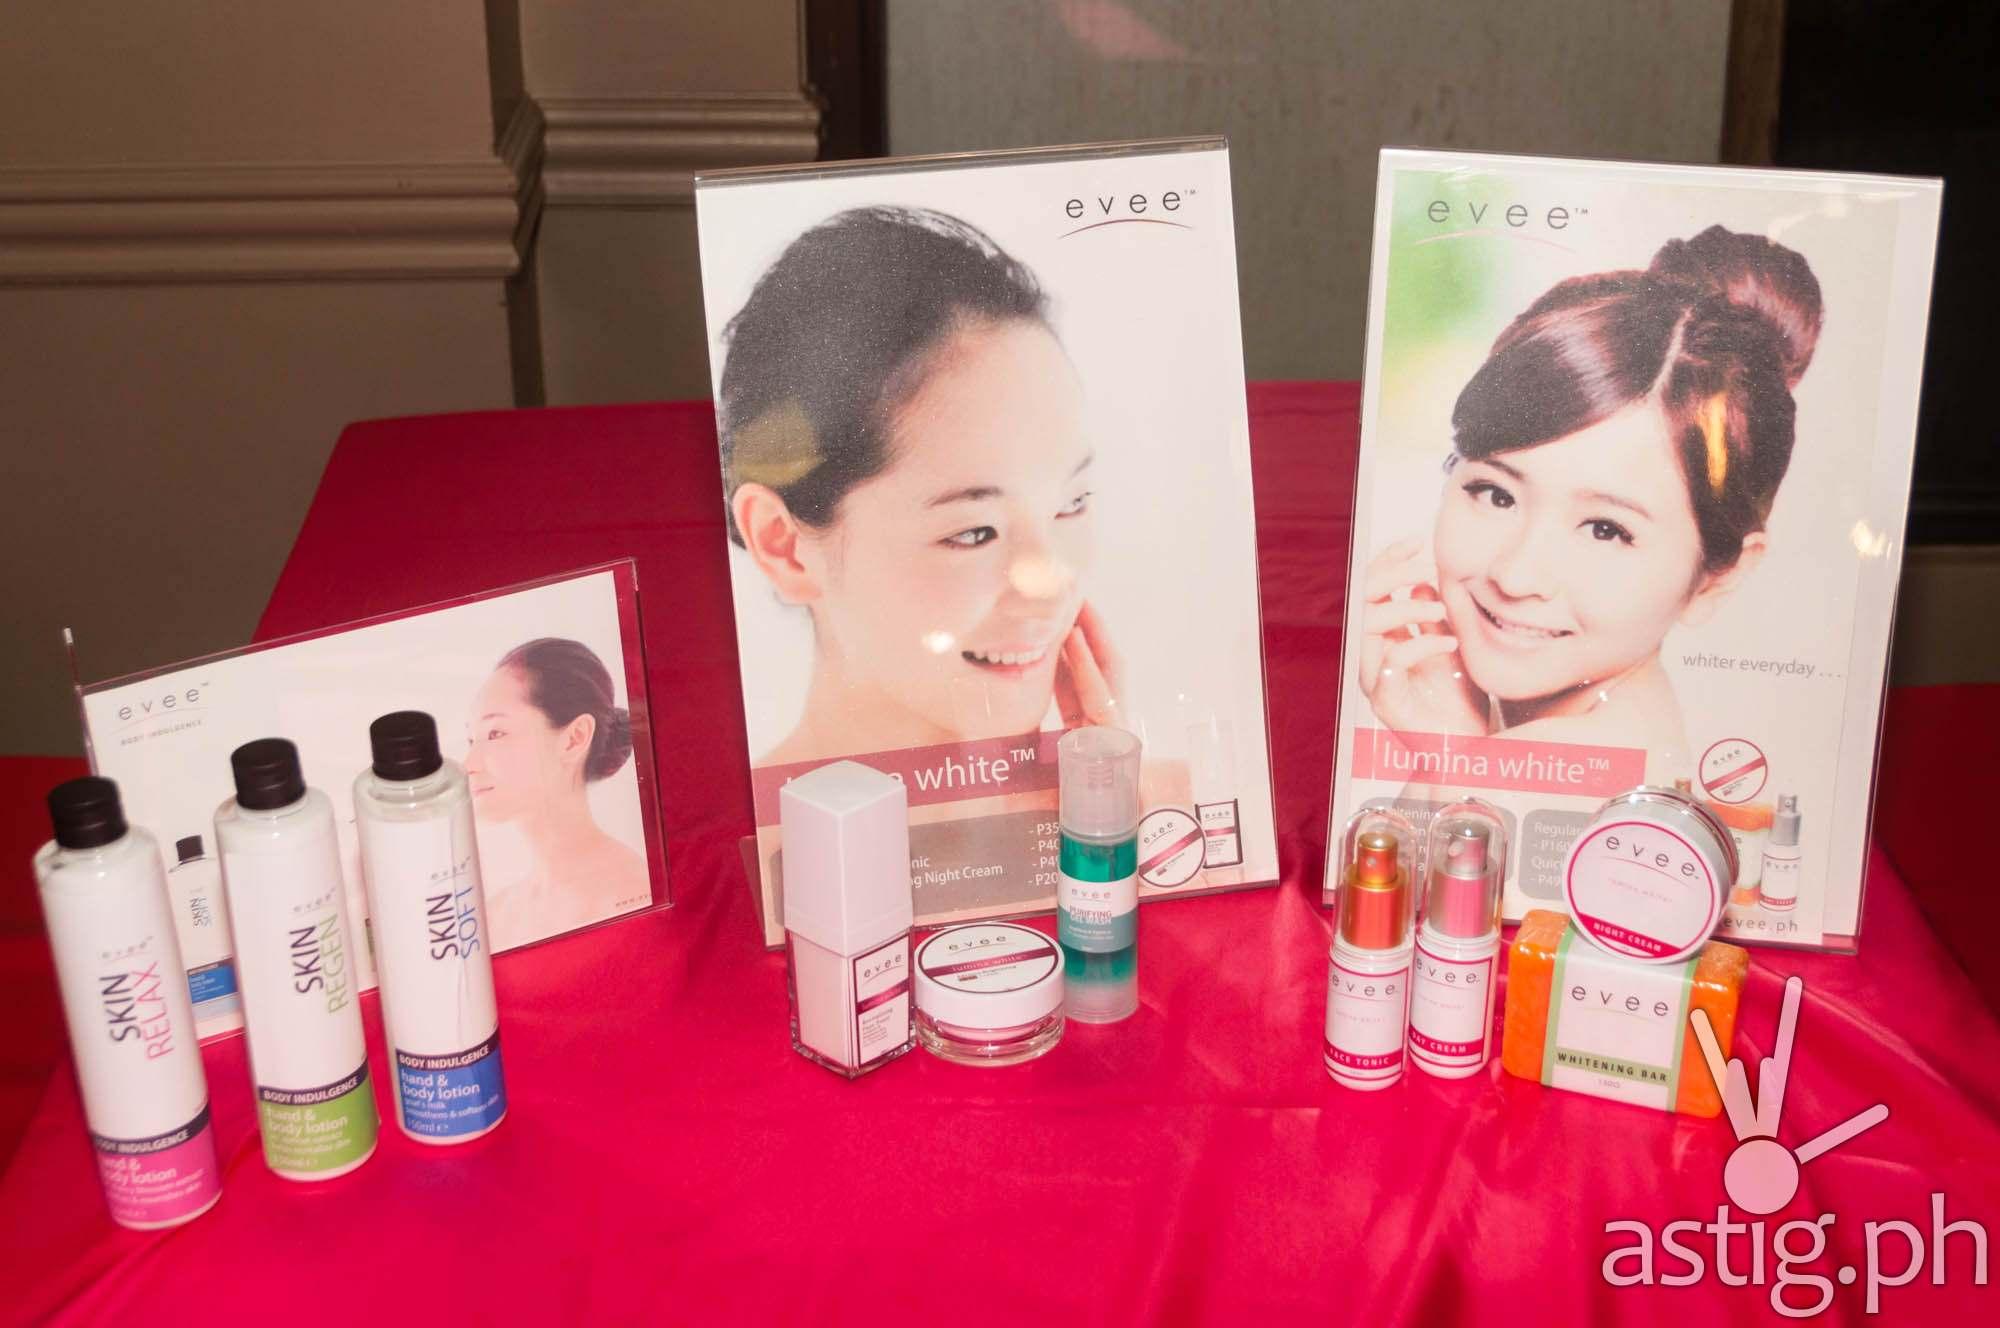 Evee lumina white and body indulgence line of skin care products